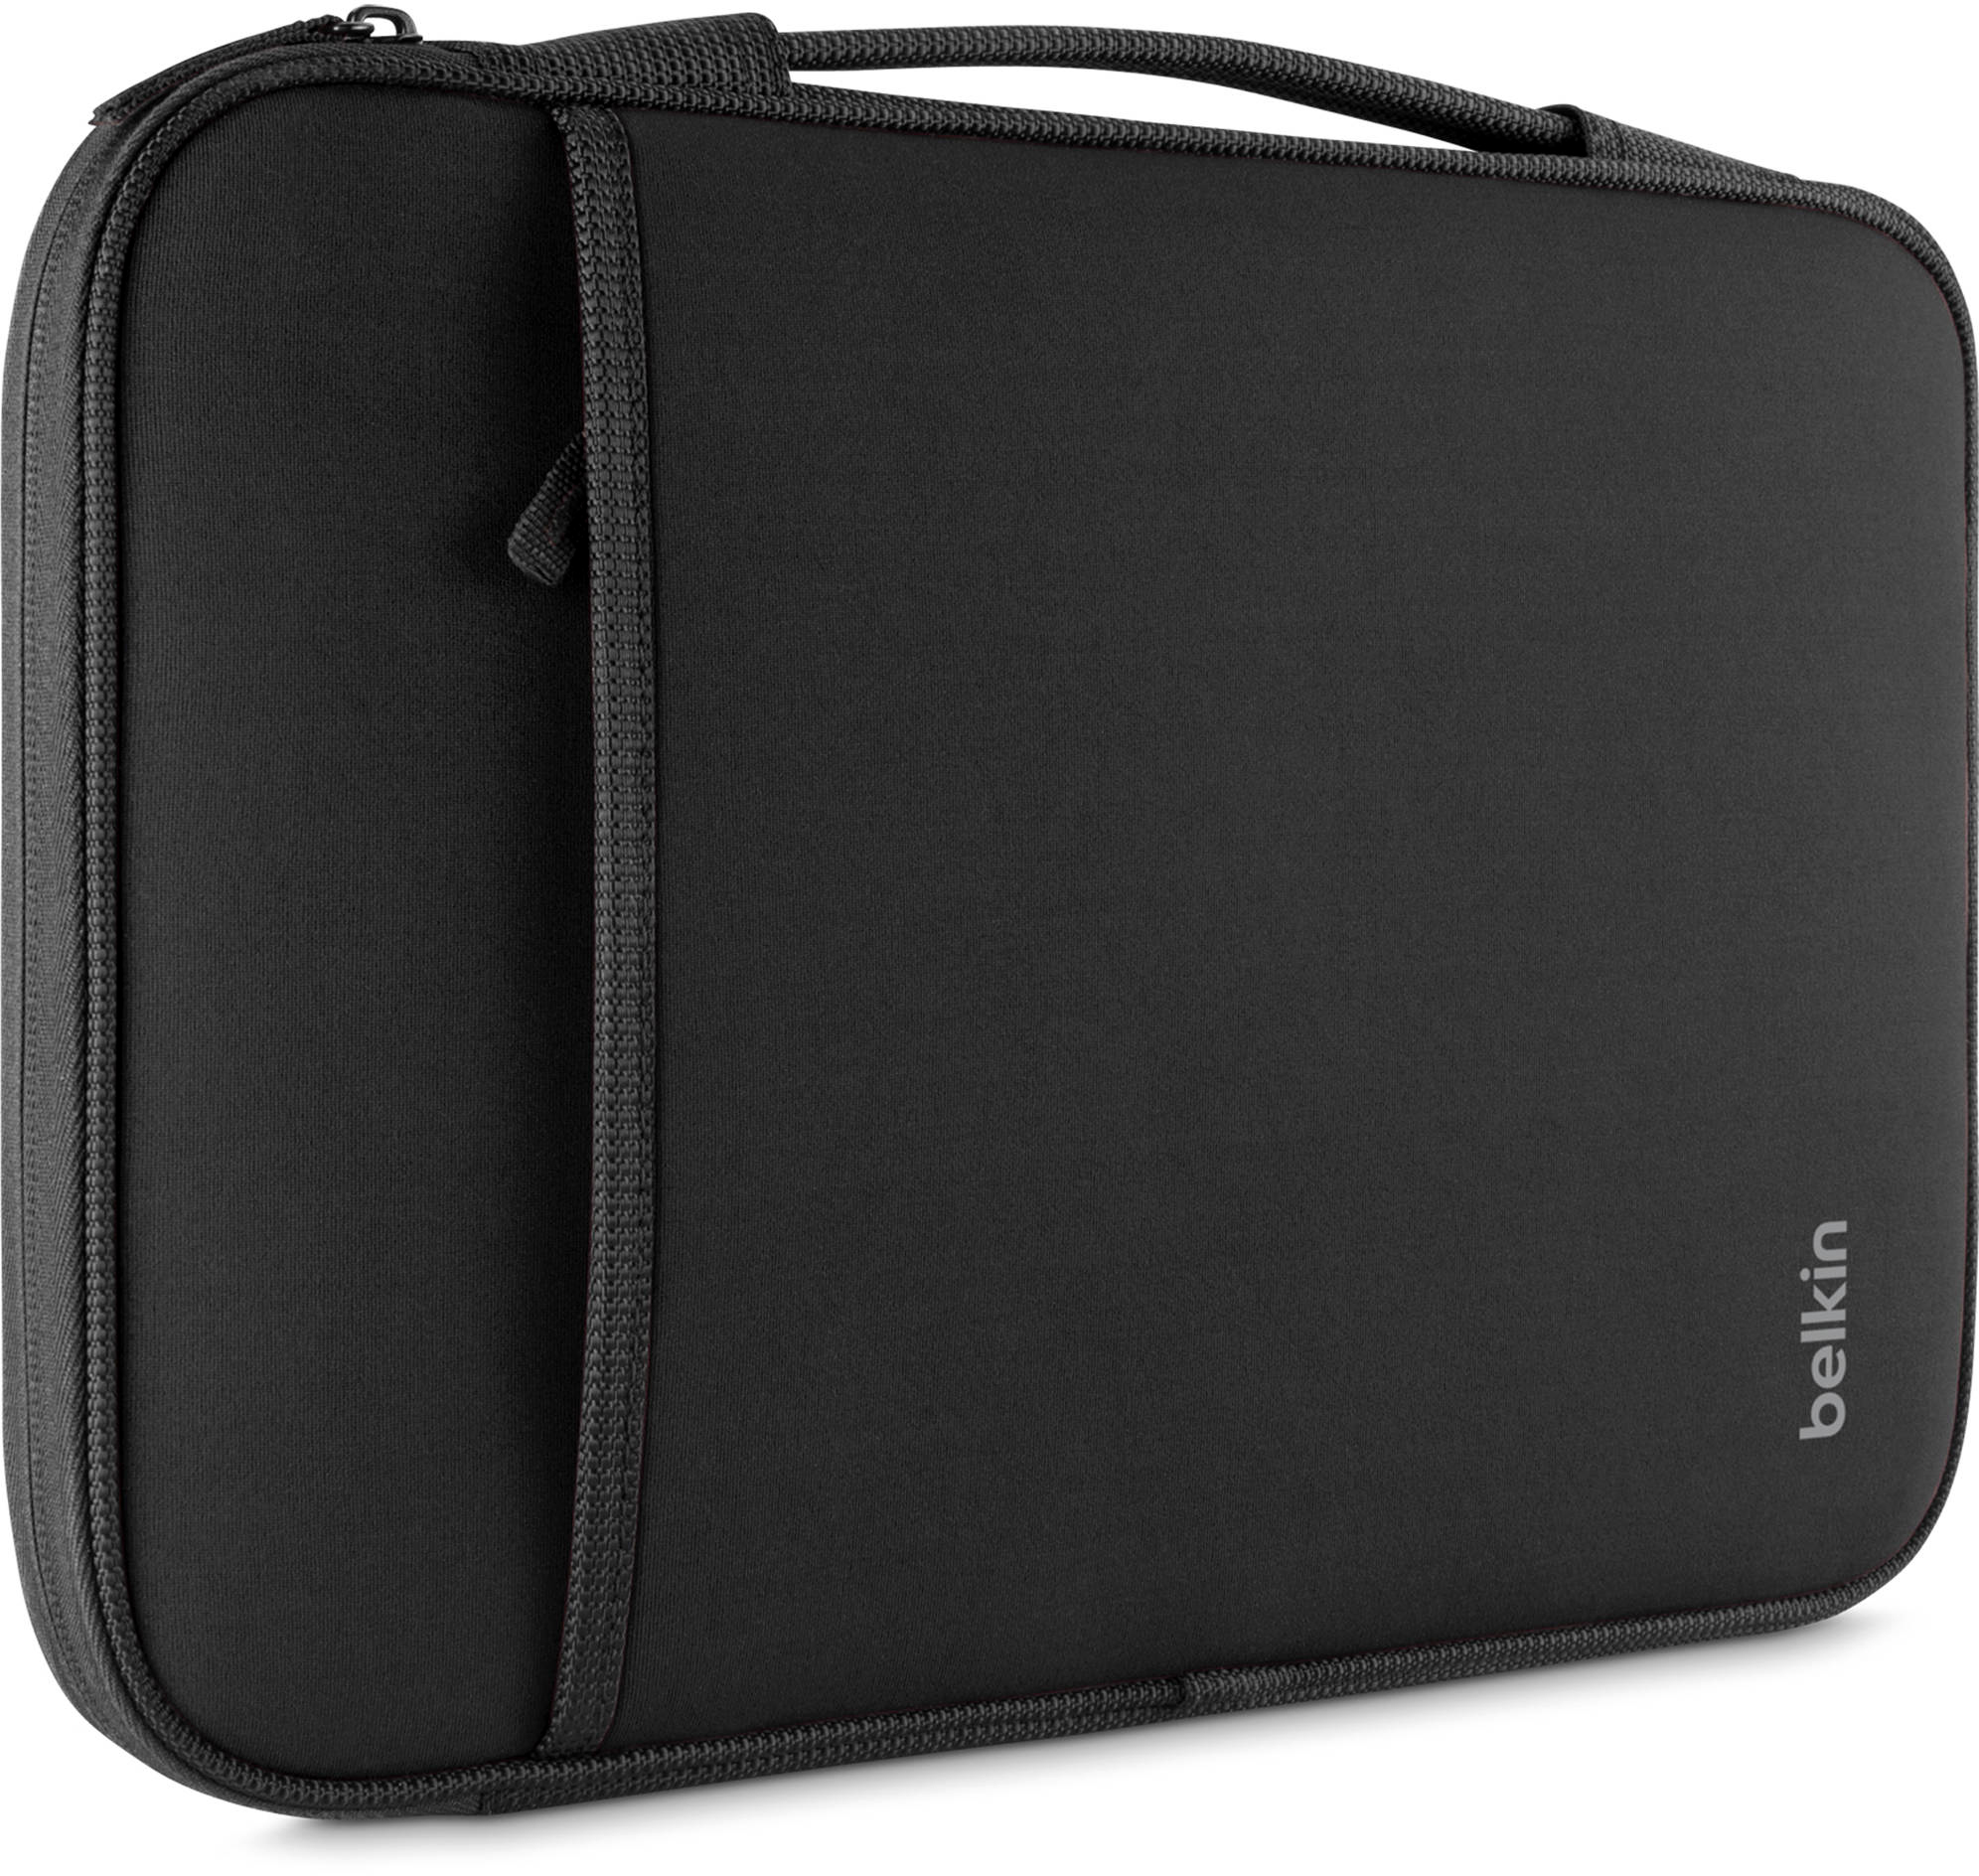 "все цены на  Belkin Cover/Sleeve (B2B075-C00) - сумка для ноутбука 14"" (Black)  онлайн"